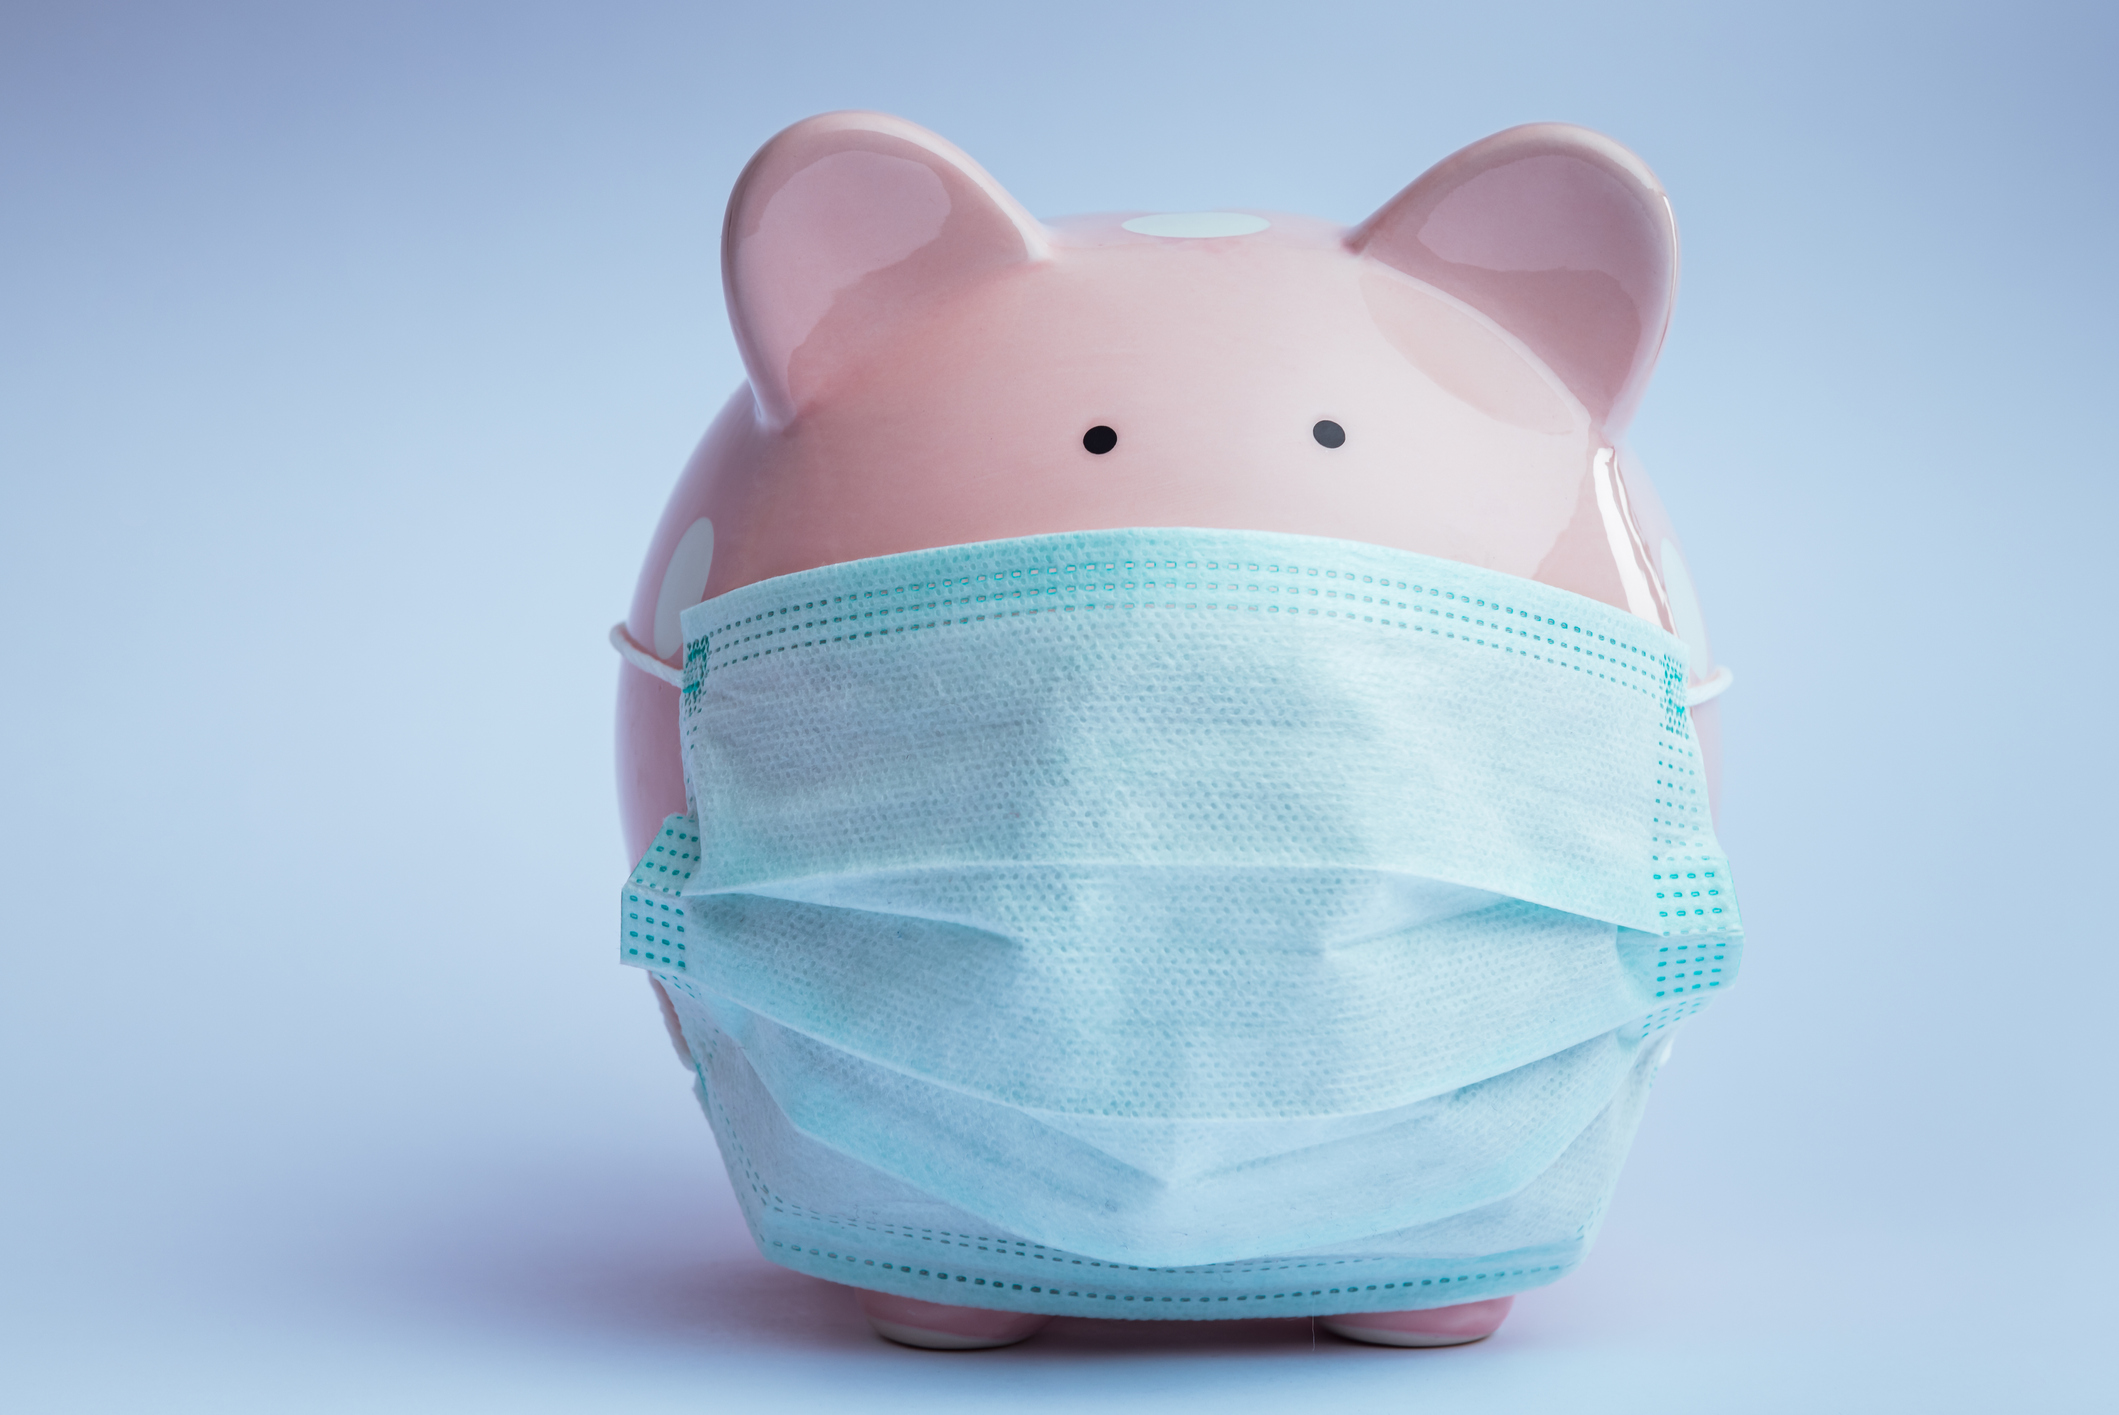 piggy bank wearing a facemask representing the coronavirus pandemic and investor/advisor communications www.paladindigitalmarketing.com